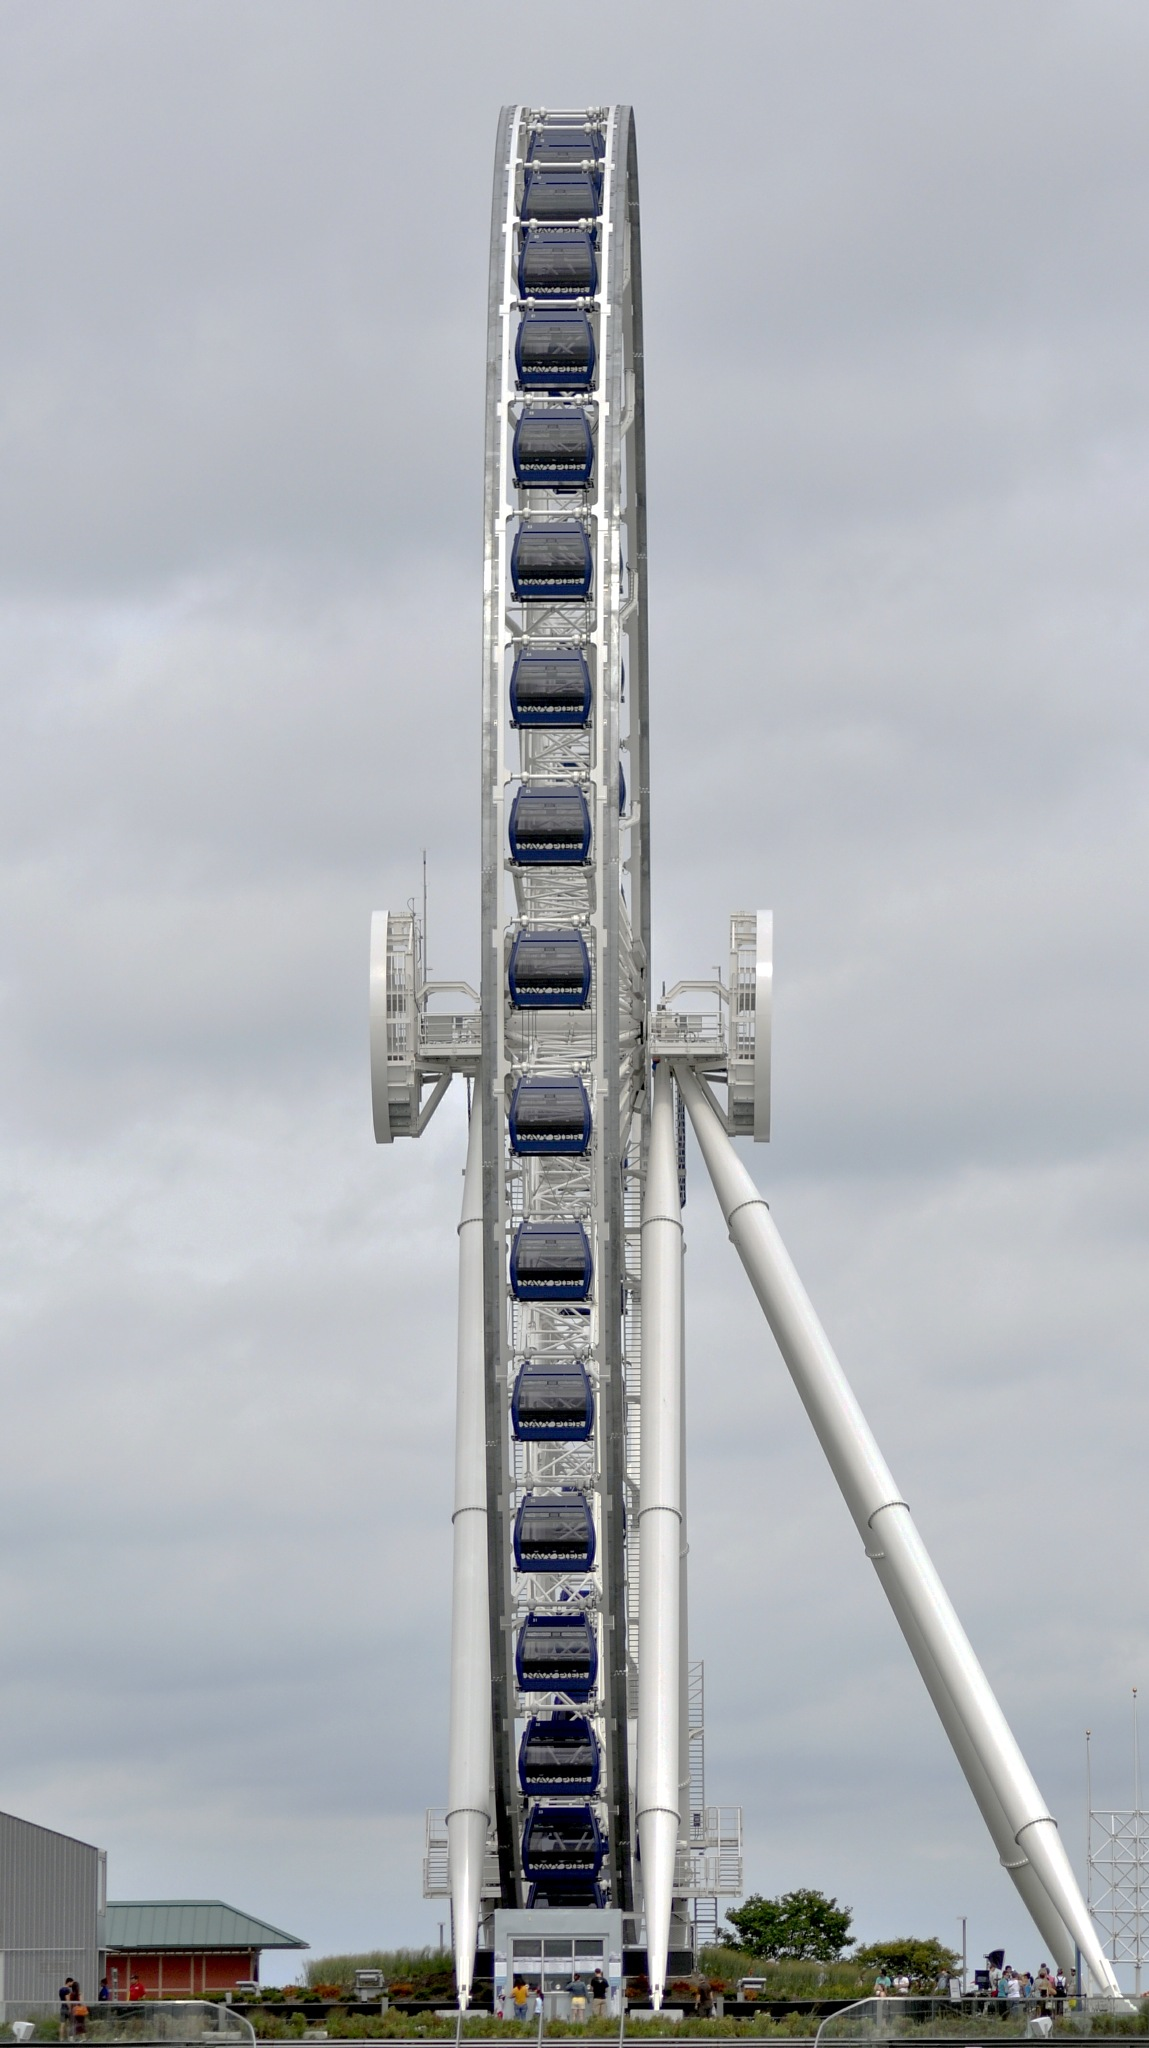 The swing wheel of Chicago by Sadiq Ali AlQatari